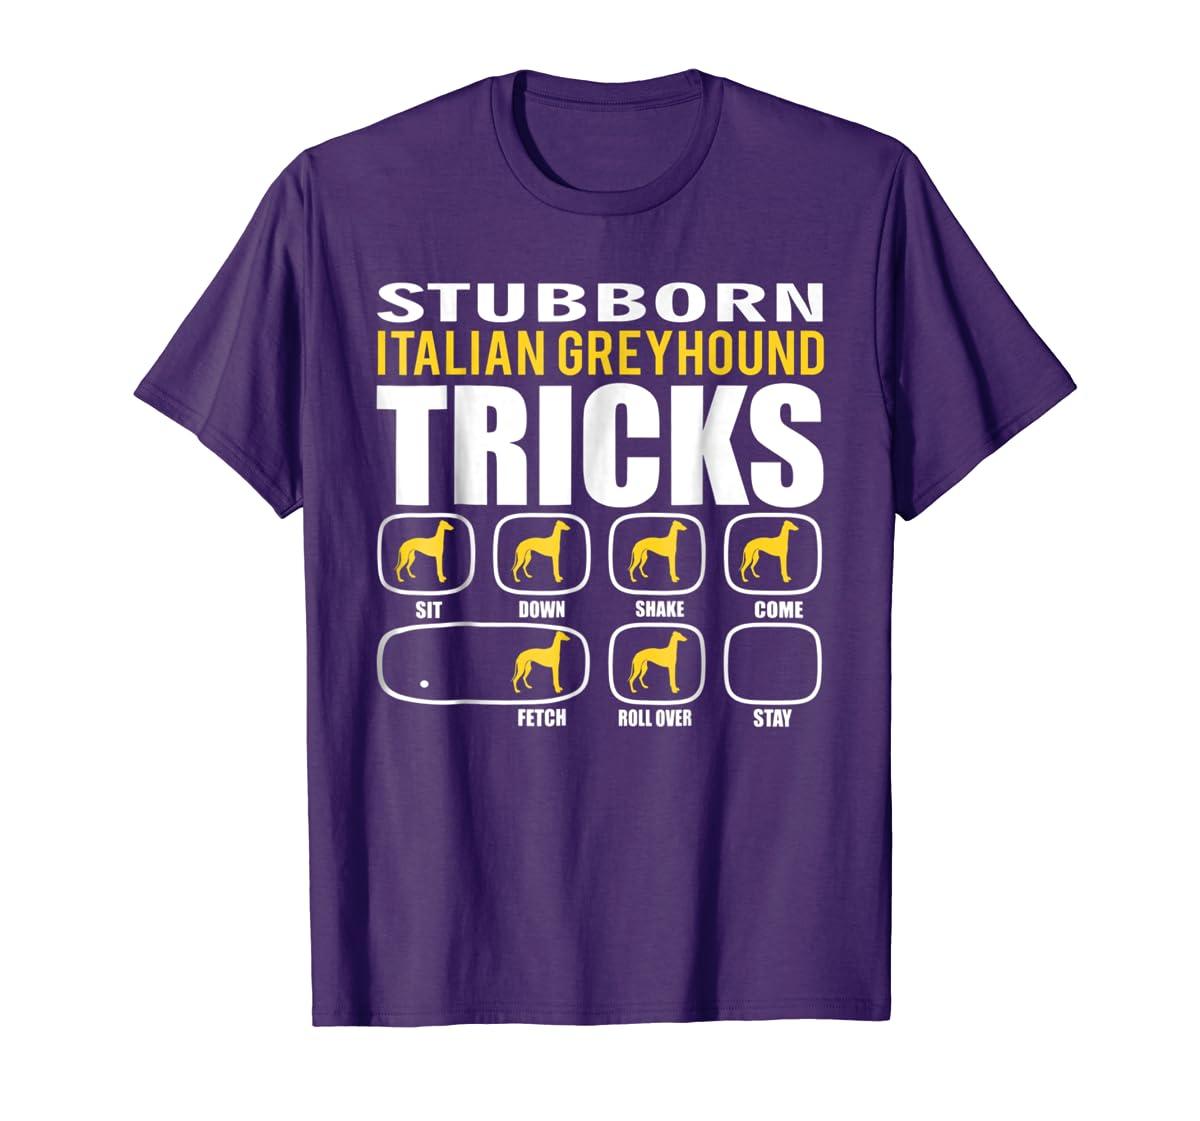 Funny Stubborn Italian Greyhound Tricks T-Shirt-Men's T-Shirt-Purple